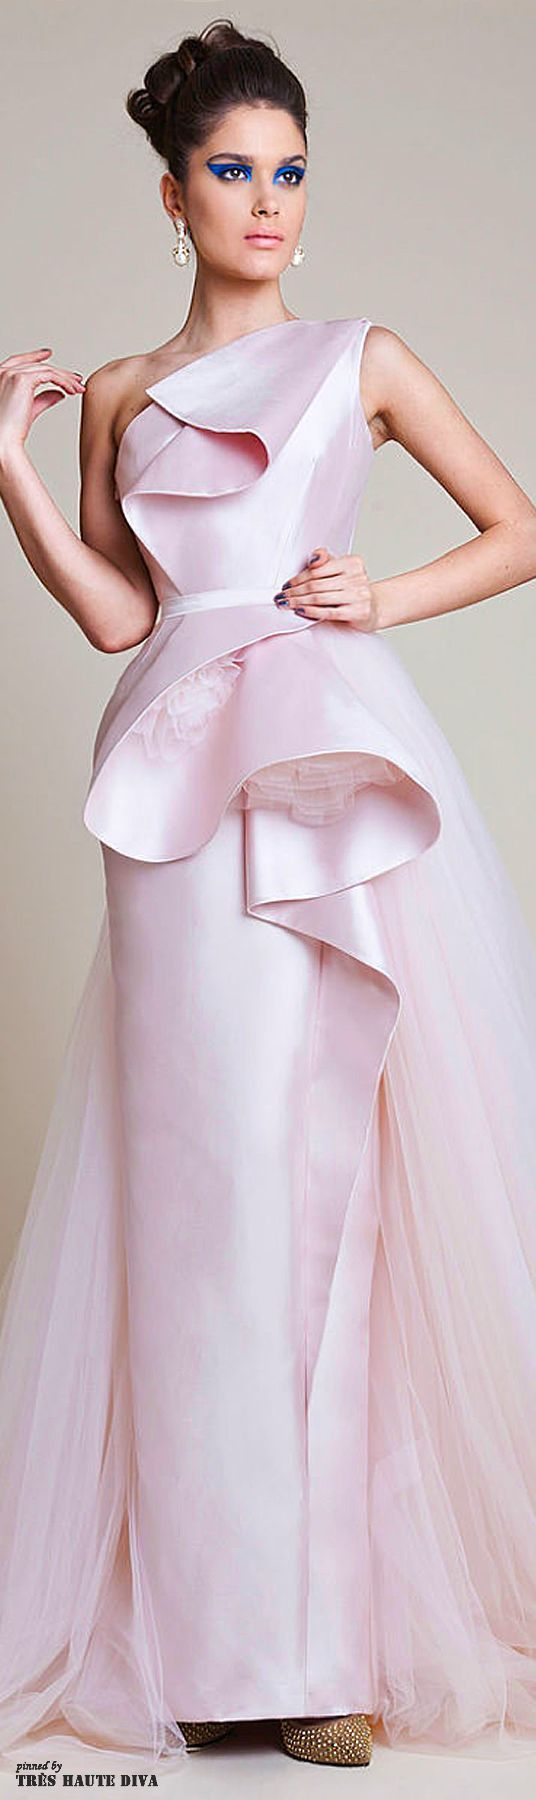 Azzi & Osta | Spring 2014 Couture